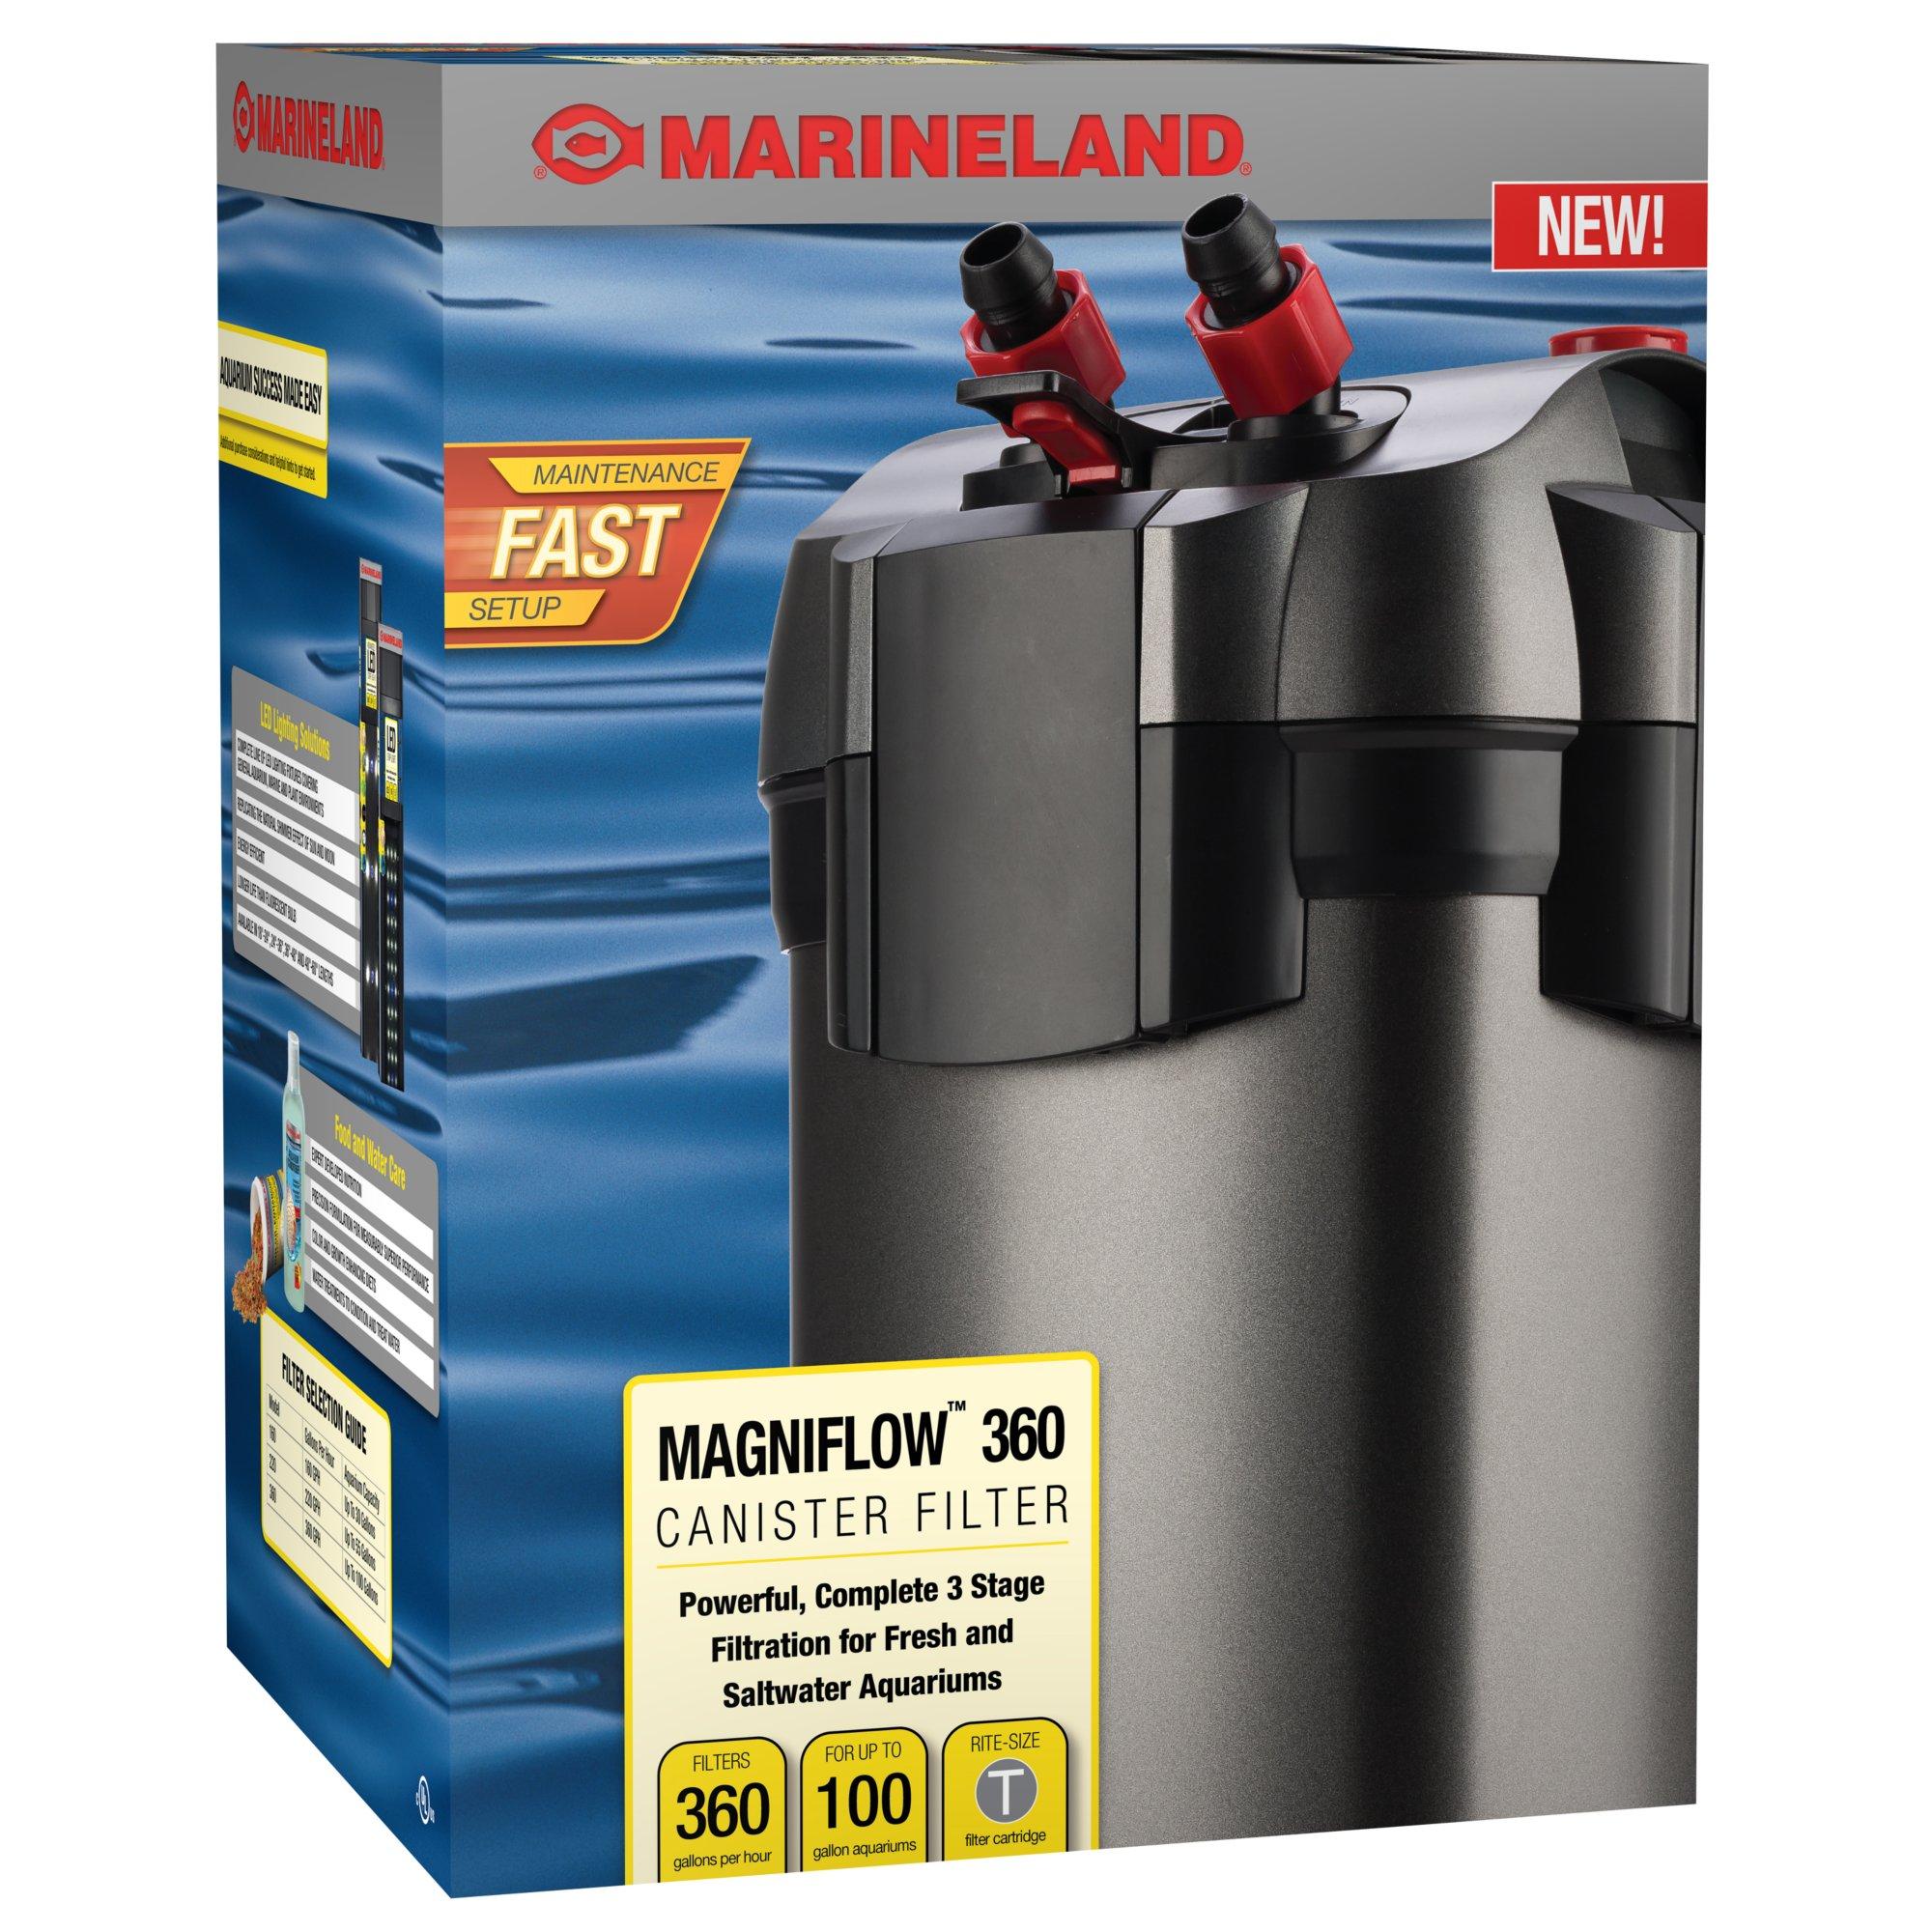 Marineland Magniflow 360 Canister Filter